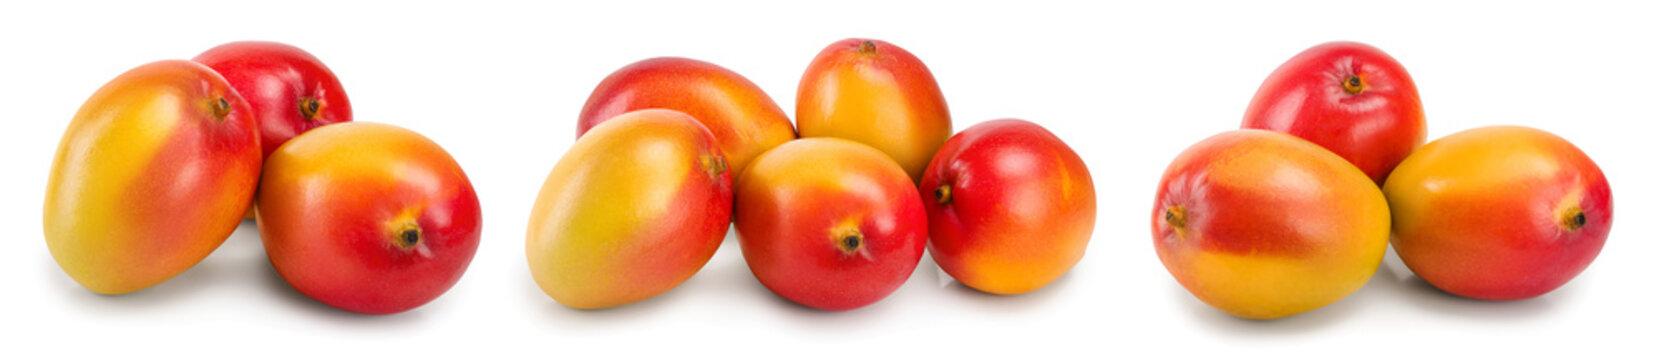 Mango fruit isolated on white background close-up. Set or collection